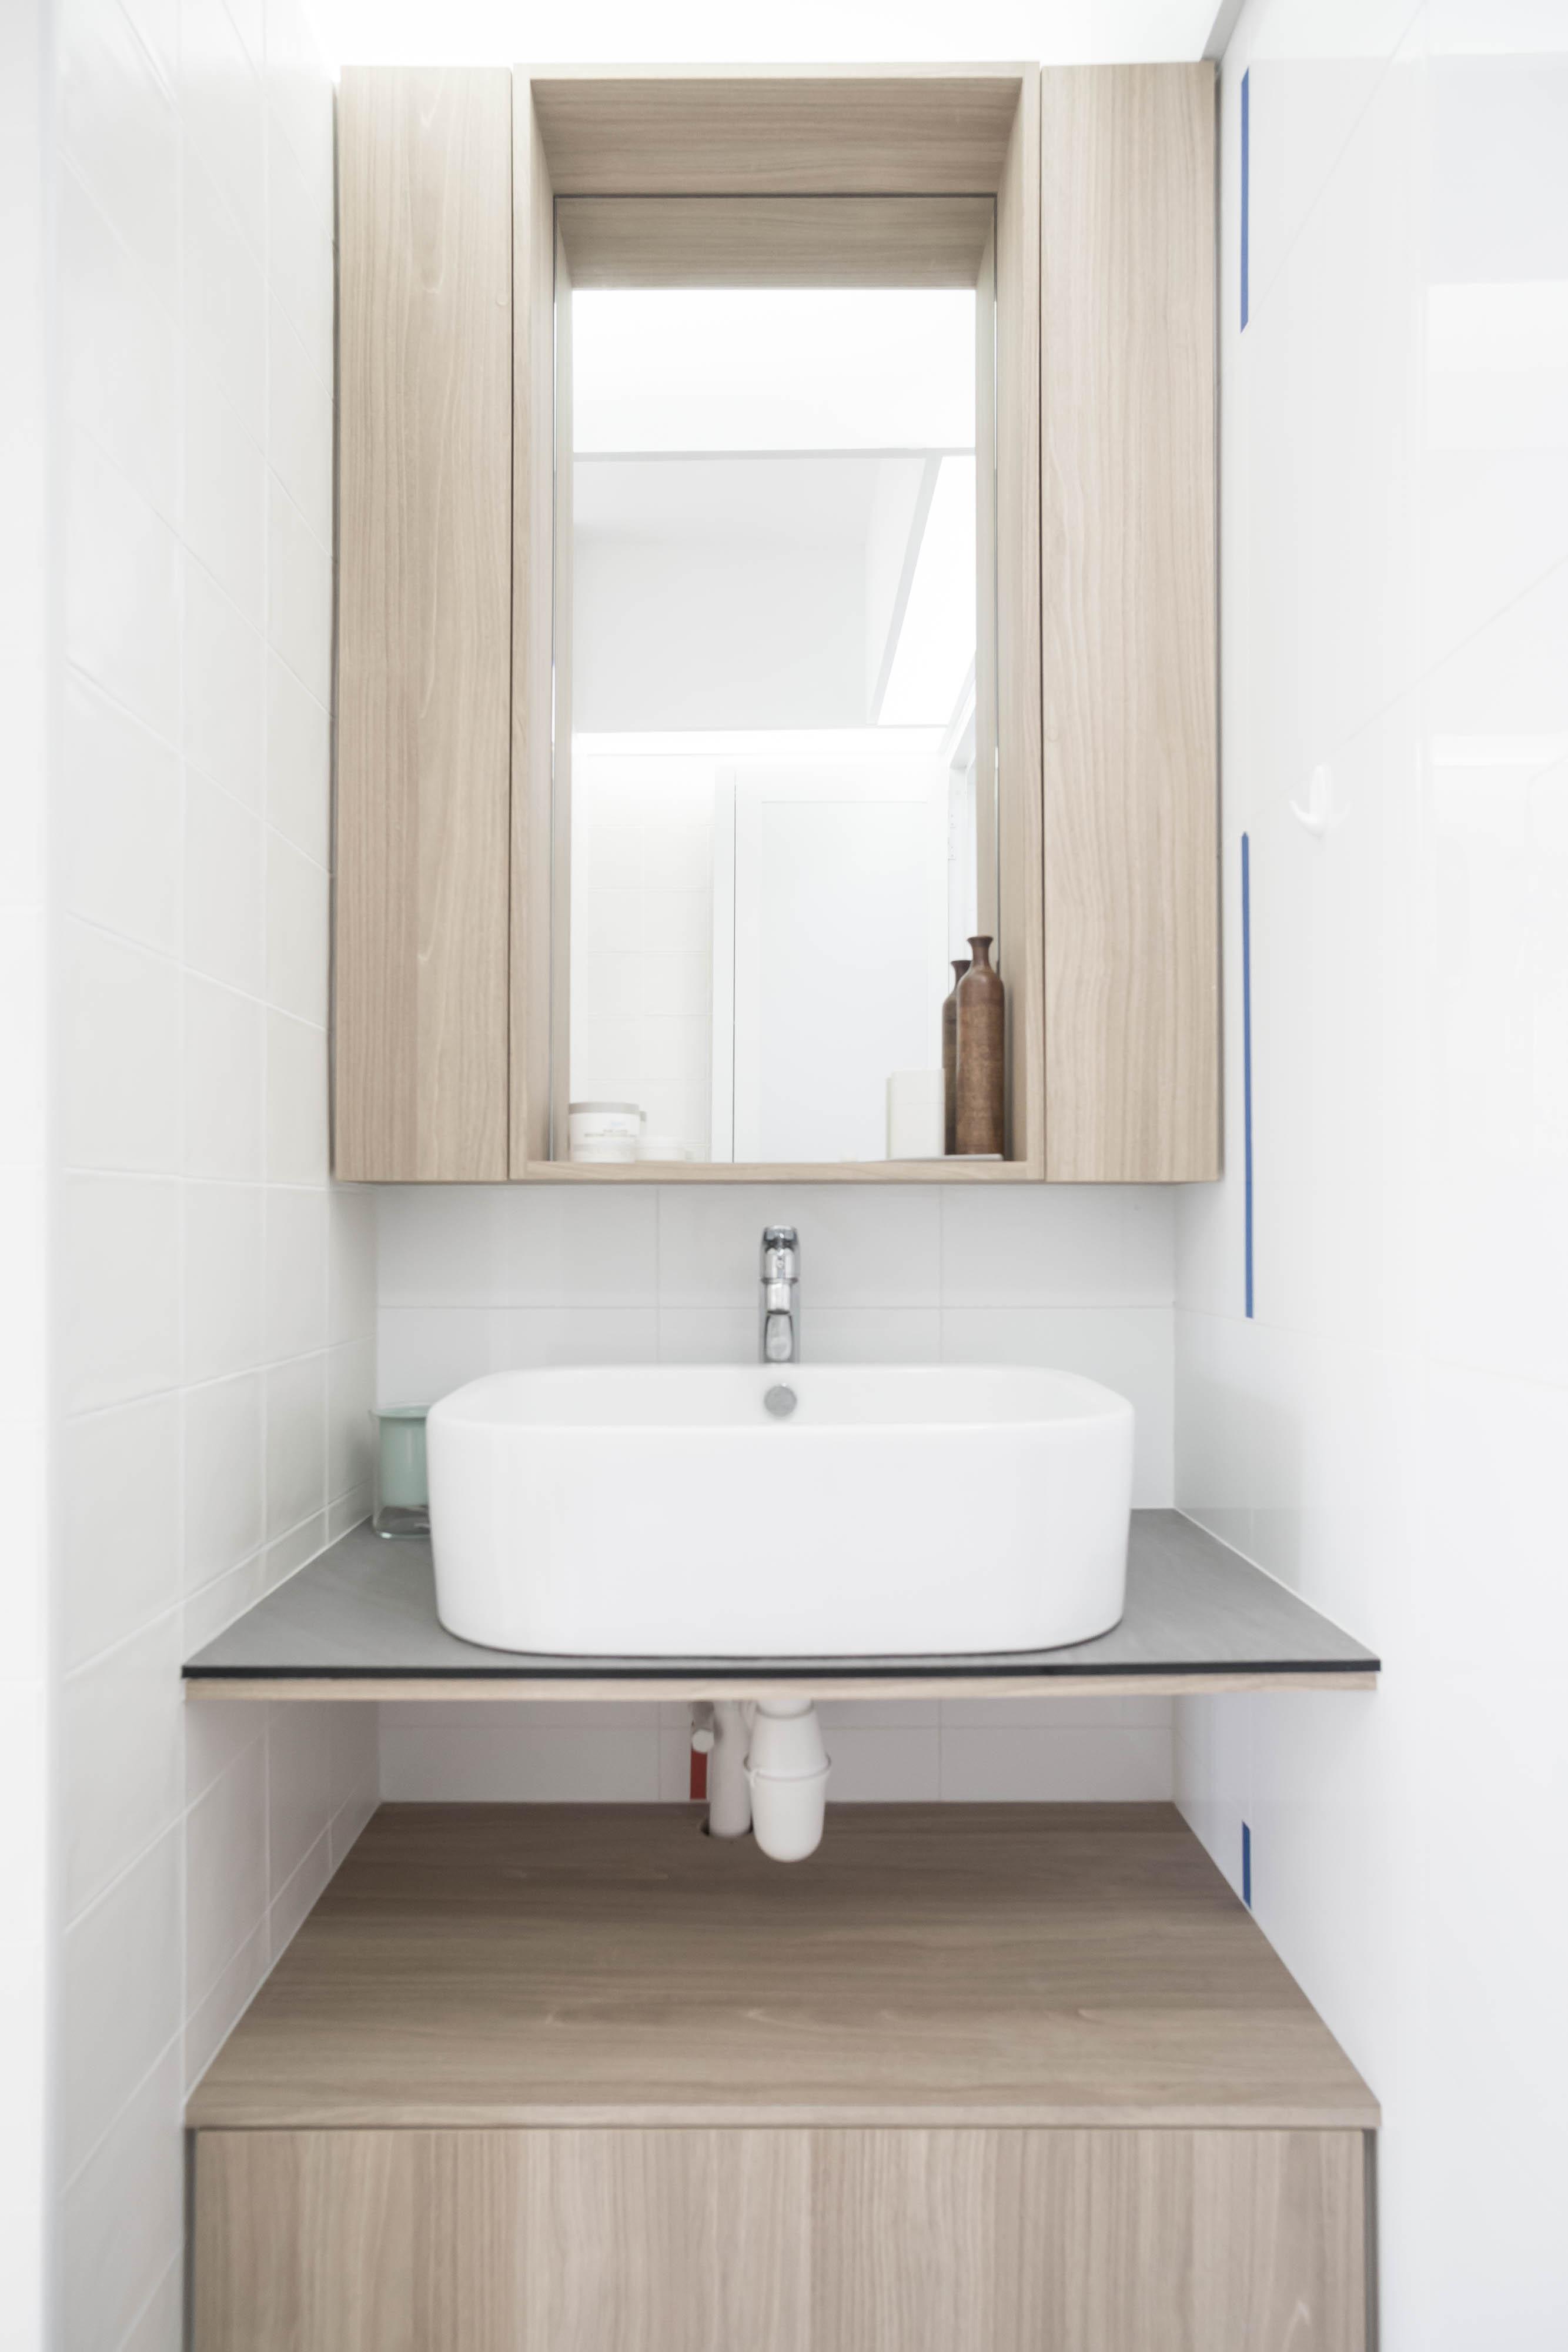 15 Bath Vanity